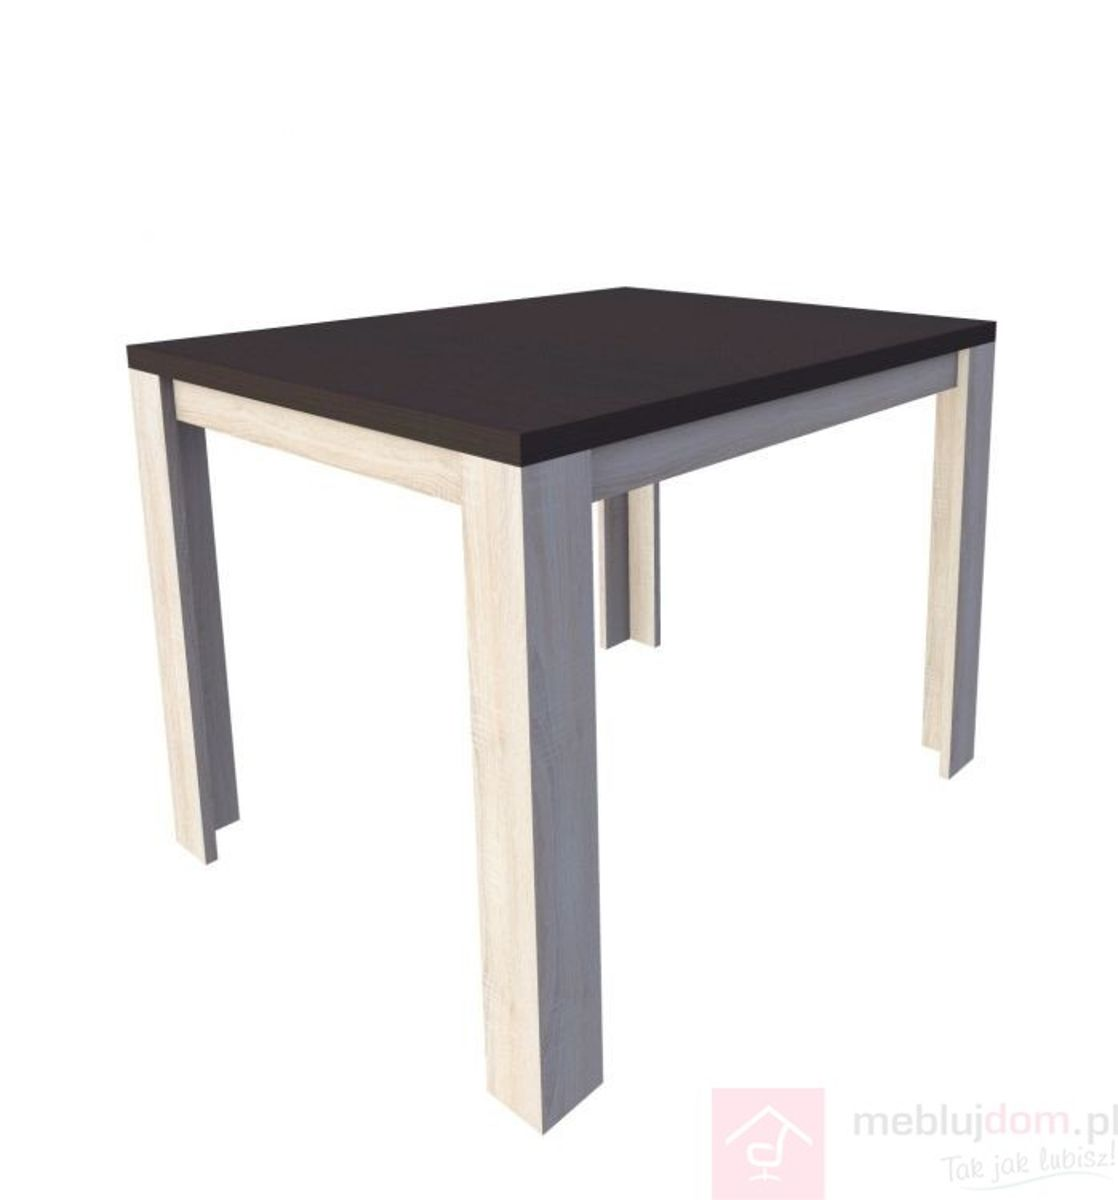 Stół LAURA LA-Stół